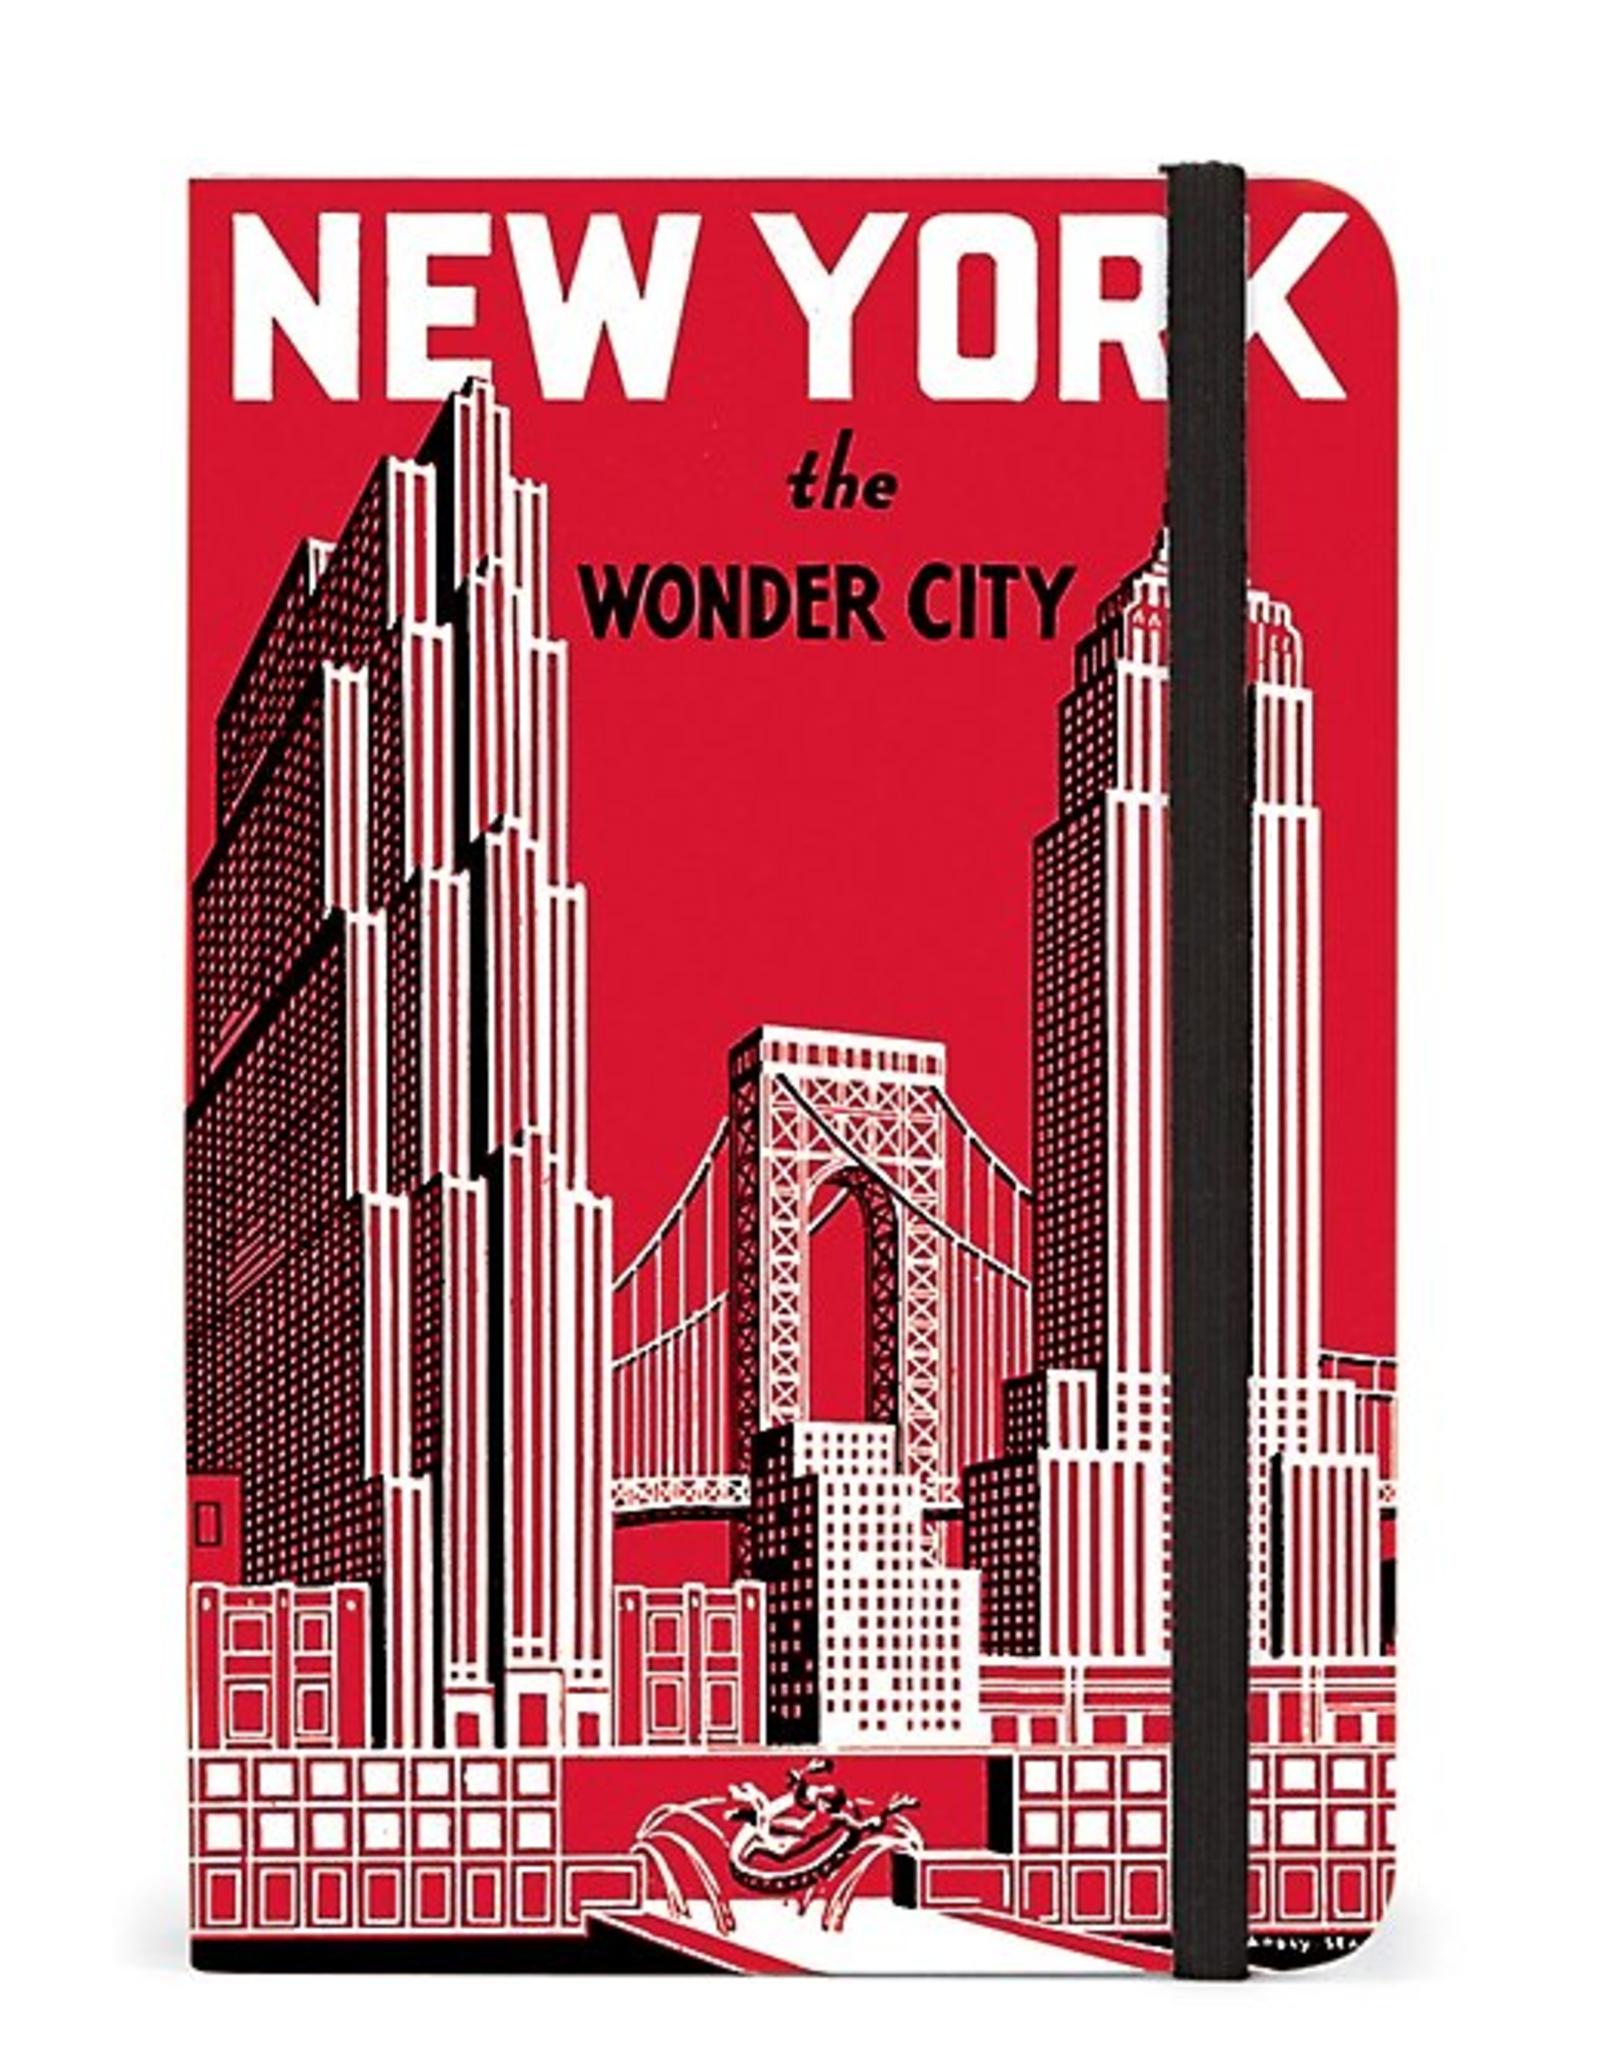 Vintage NYC notebook 4x6